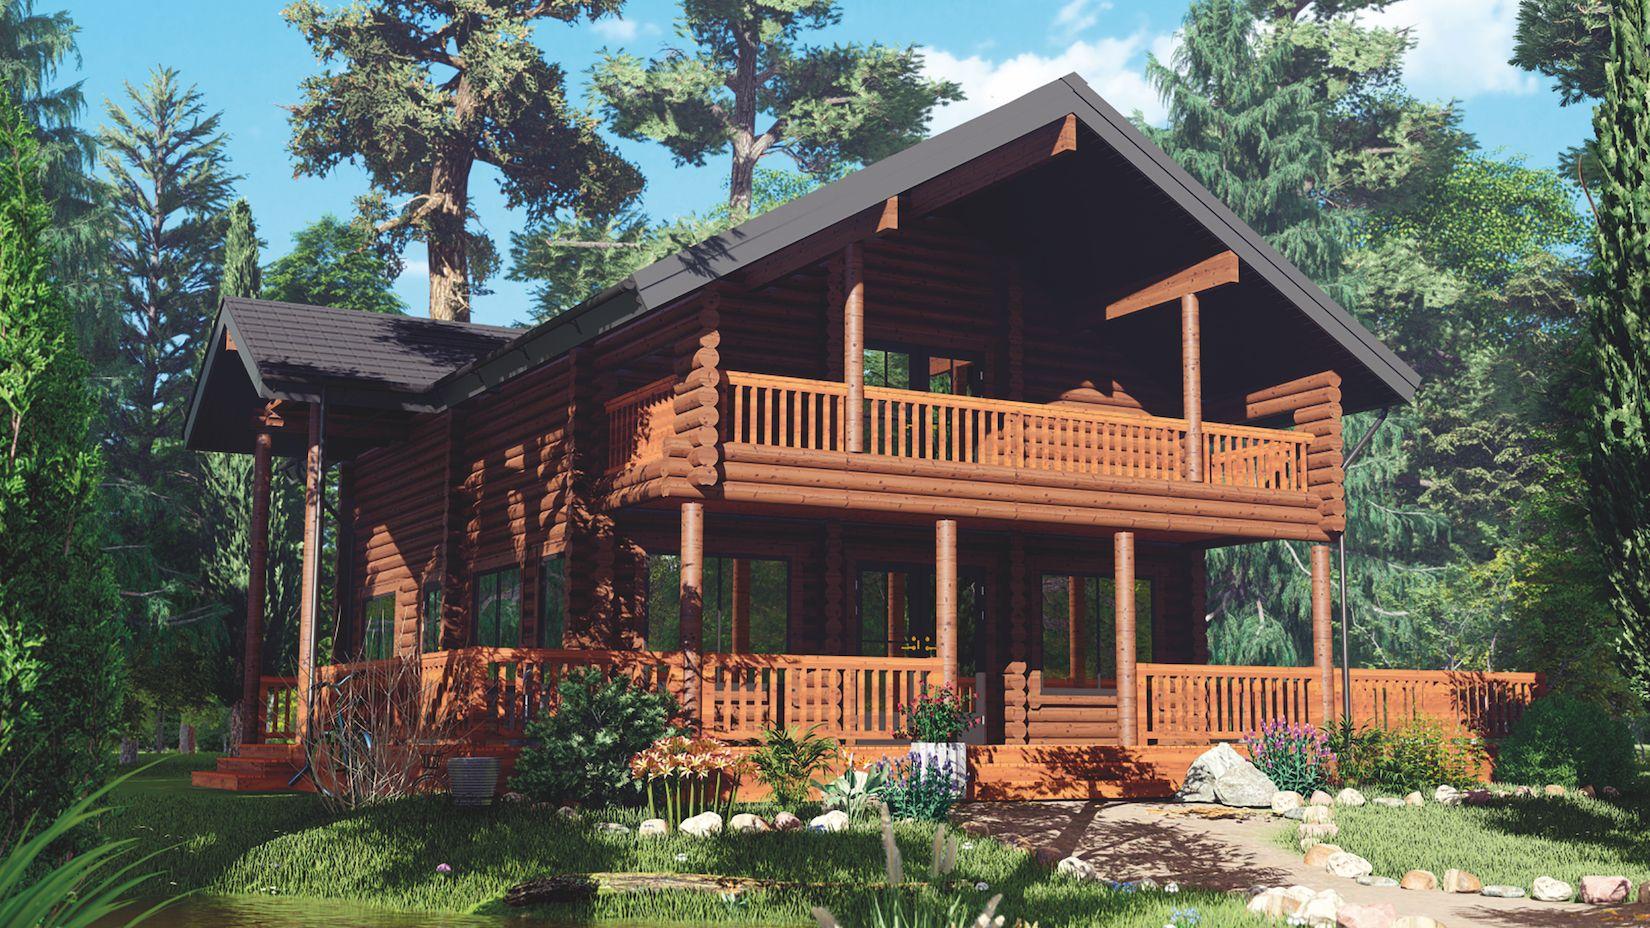 The Wrexham – 3 Bedroom, 1.5 Storey Log Home